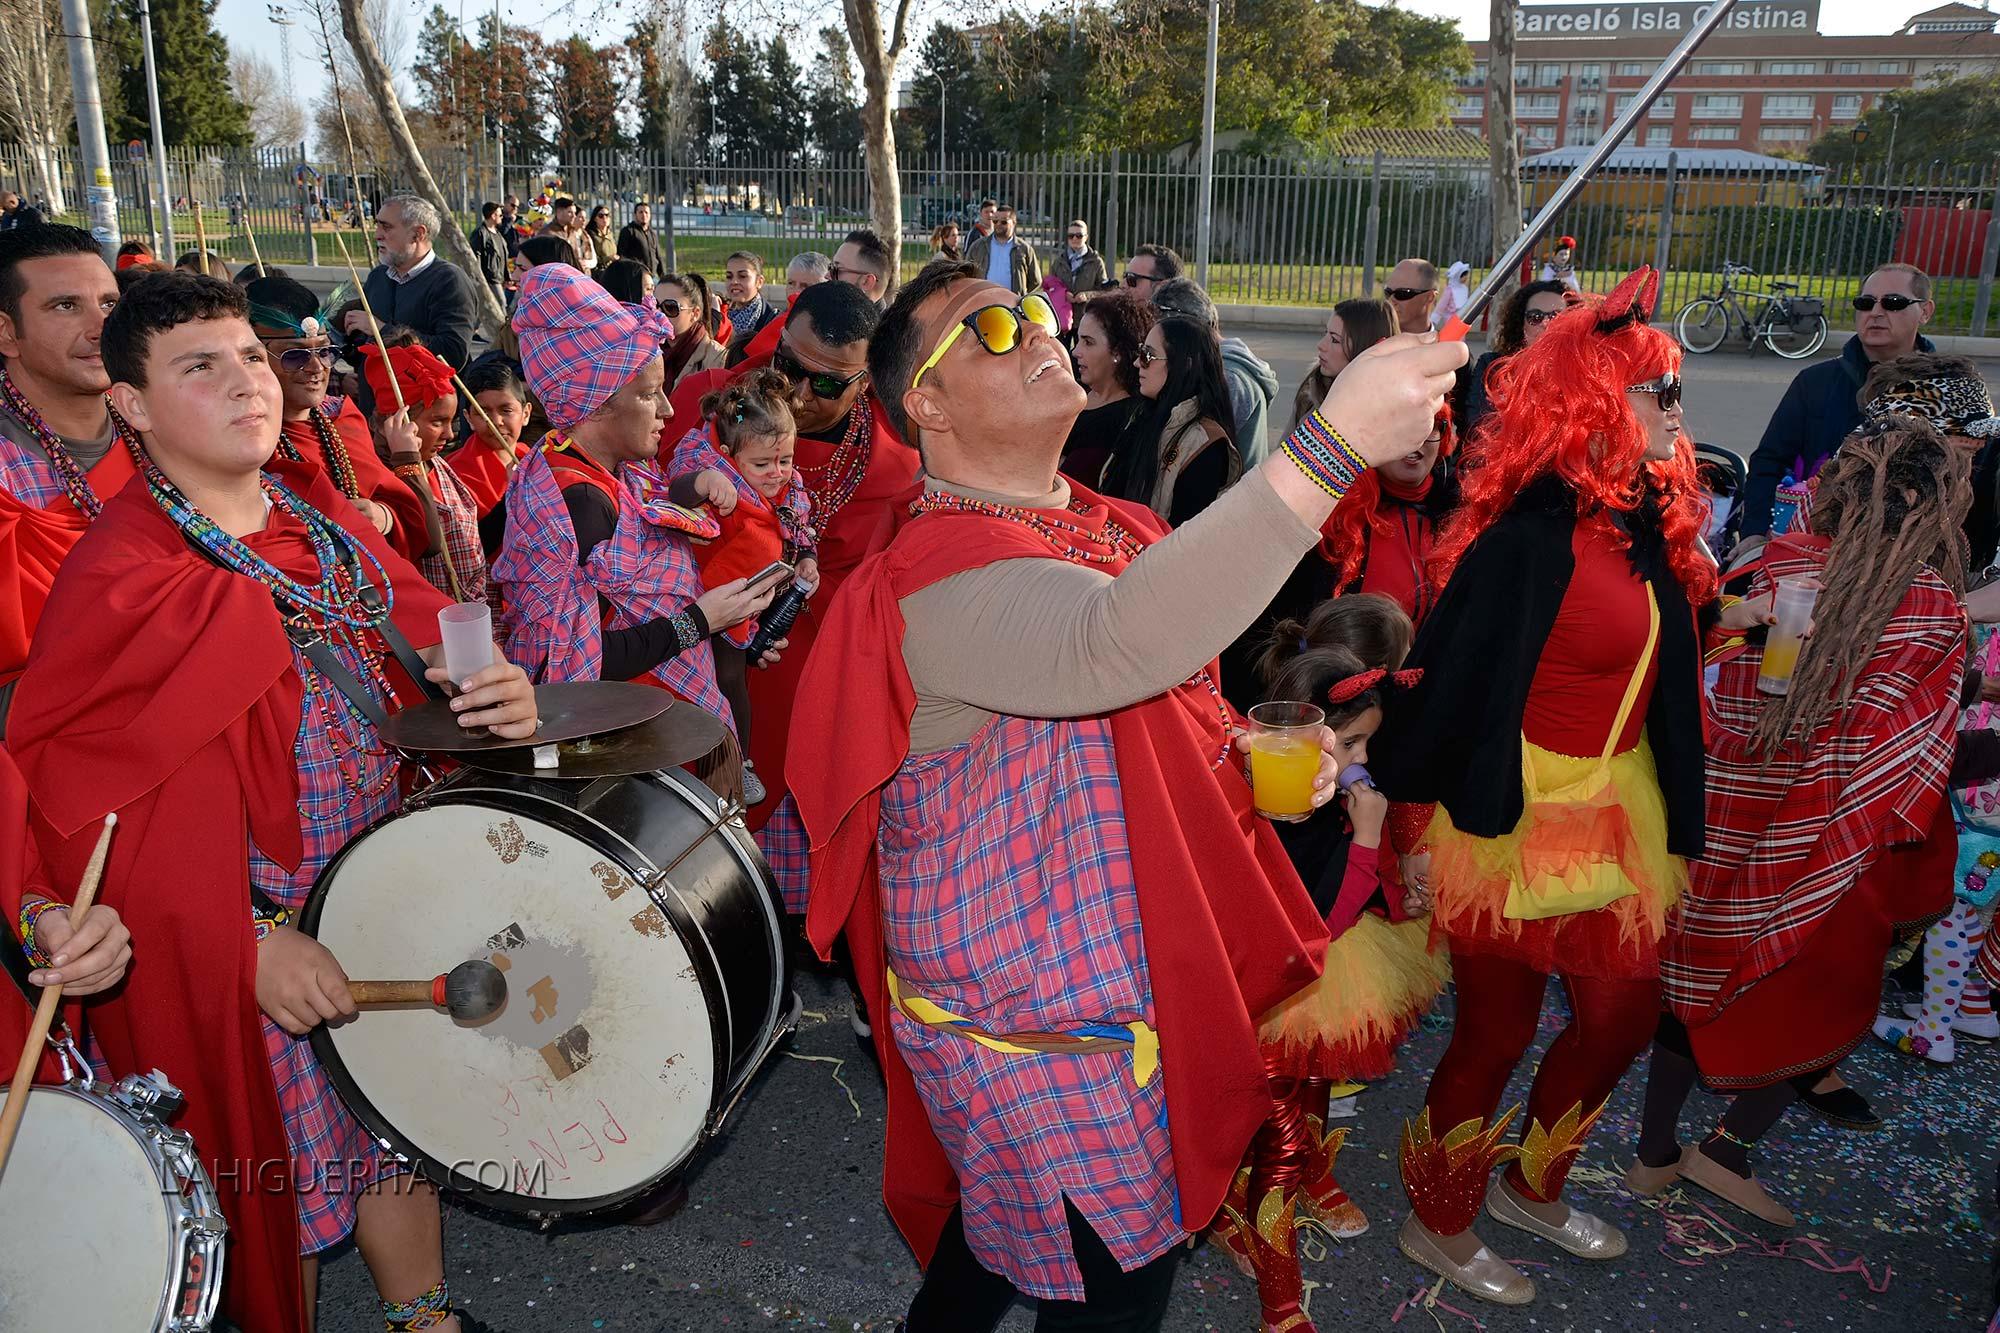 cabalgata carnaval isla cristina _DSC0701